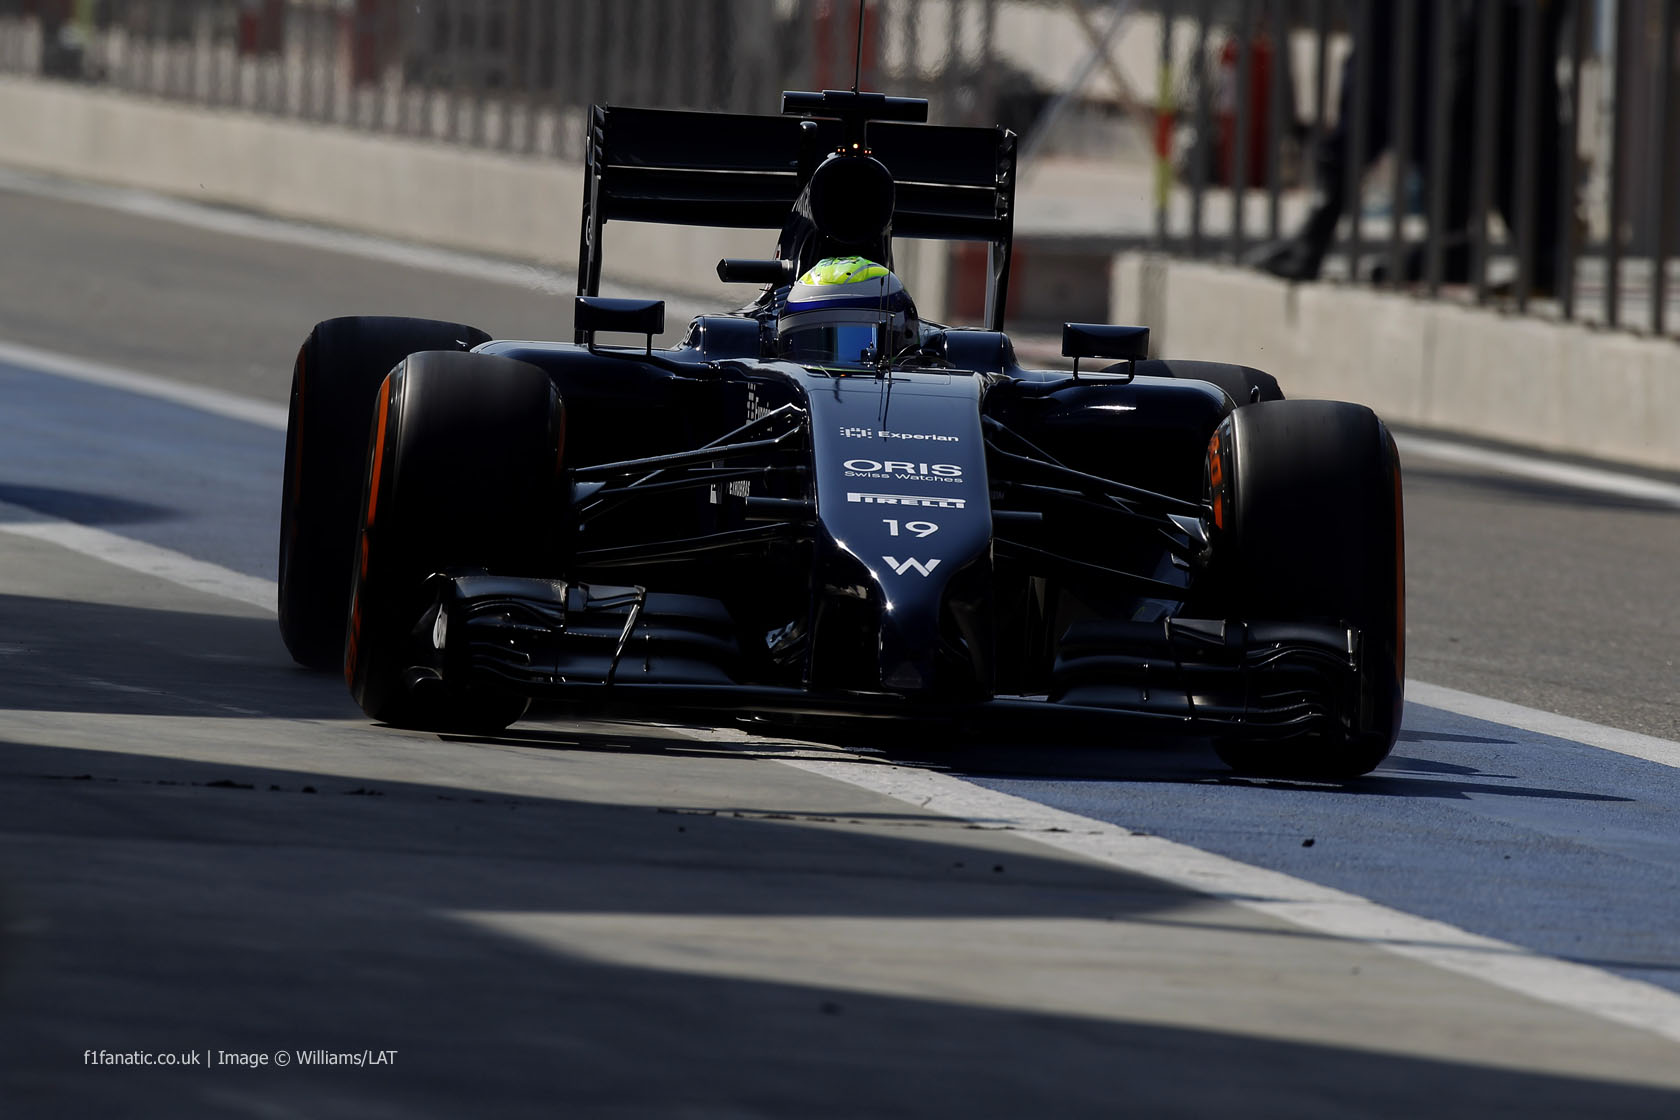 Felipe Massa, Williams, Bahrain, 2014